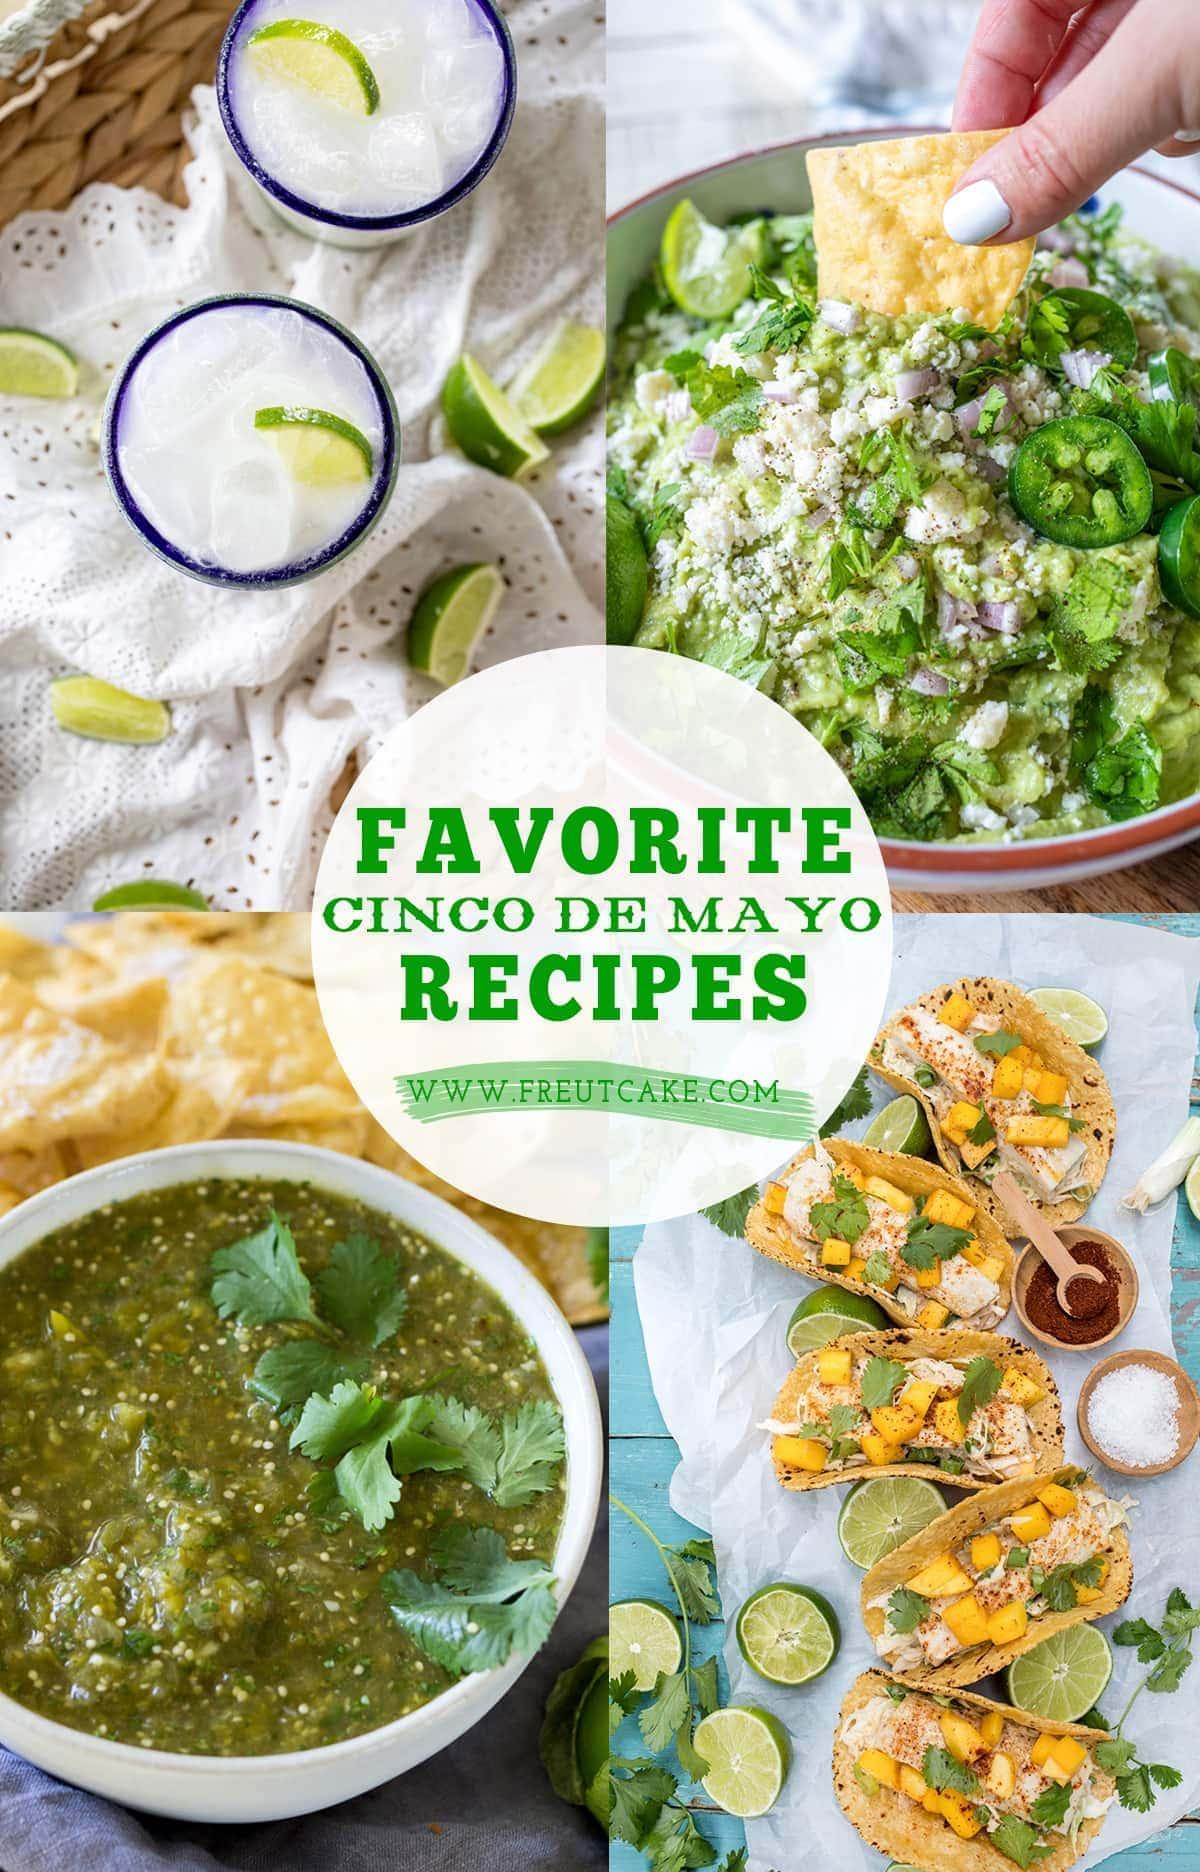 Favorite Cinco De Mayo Recipes